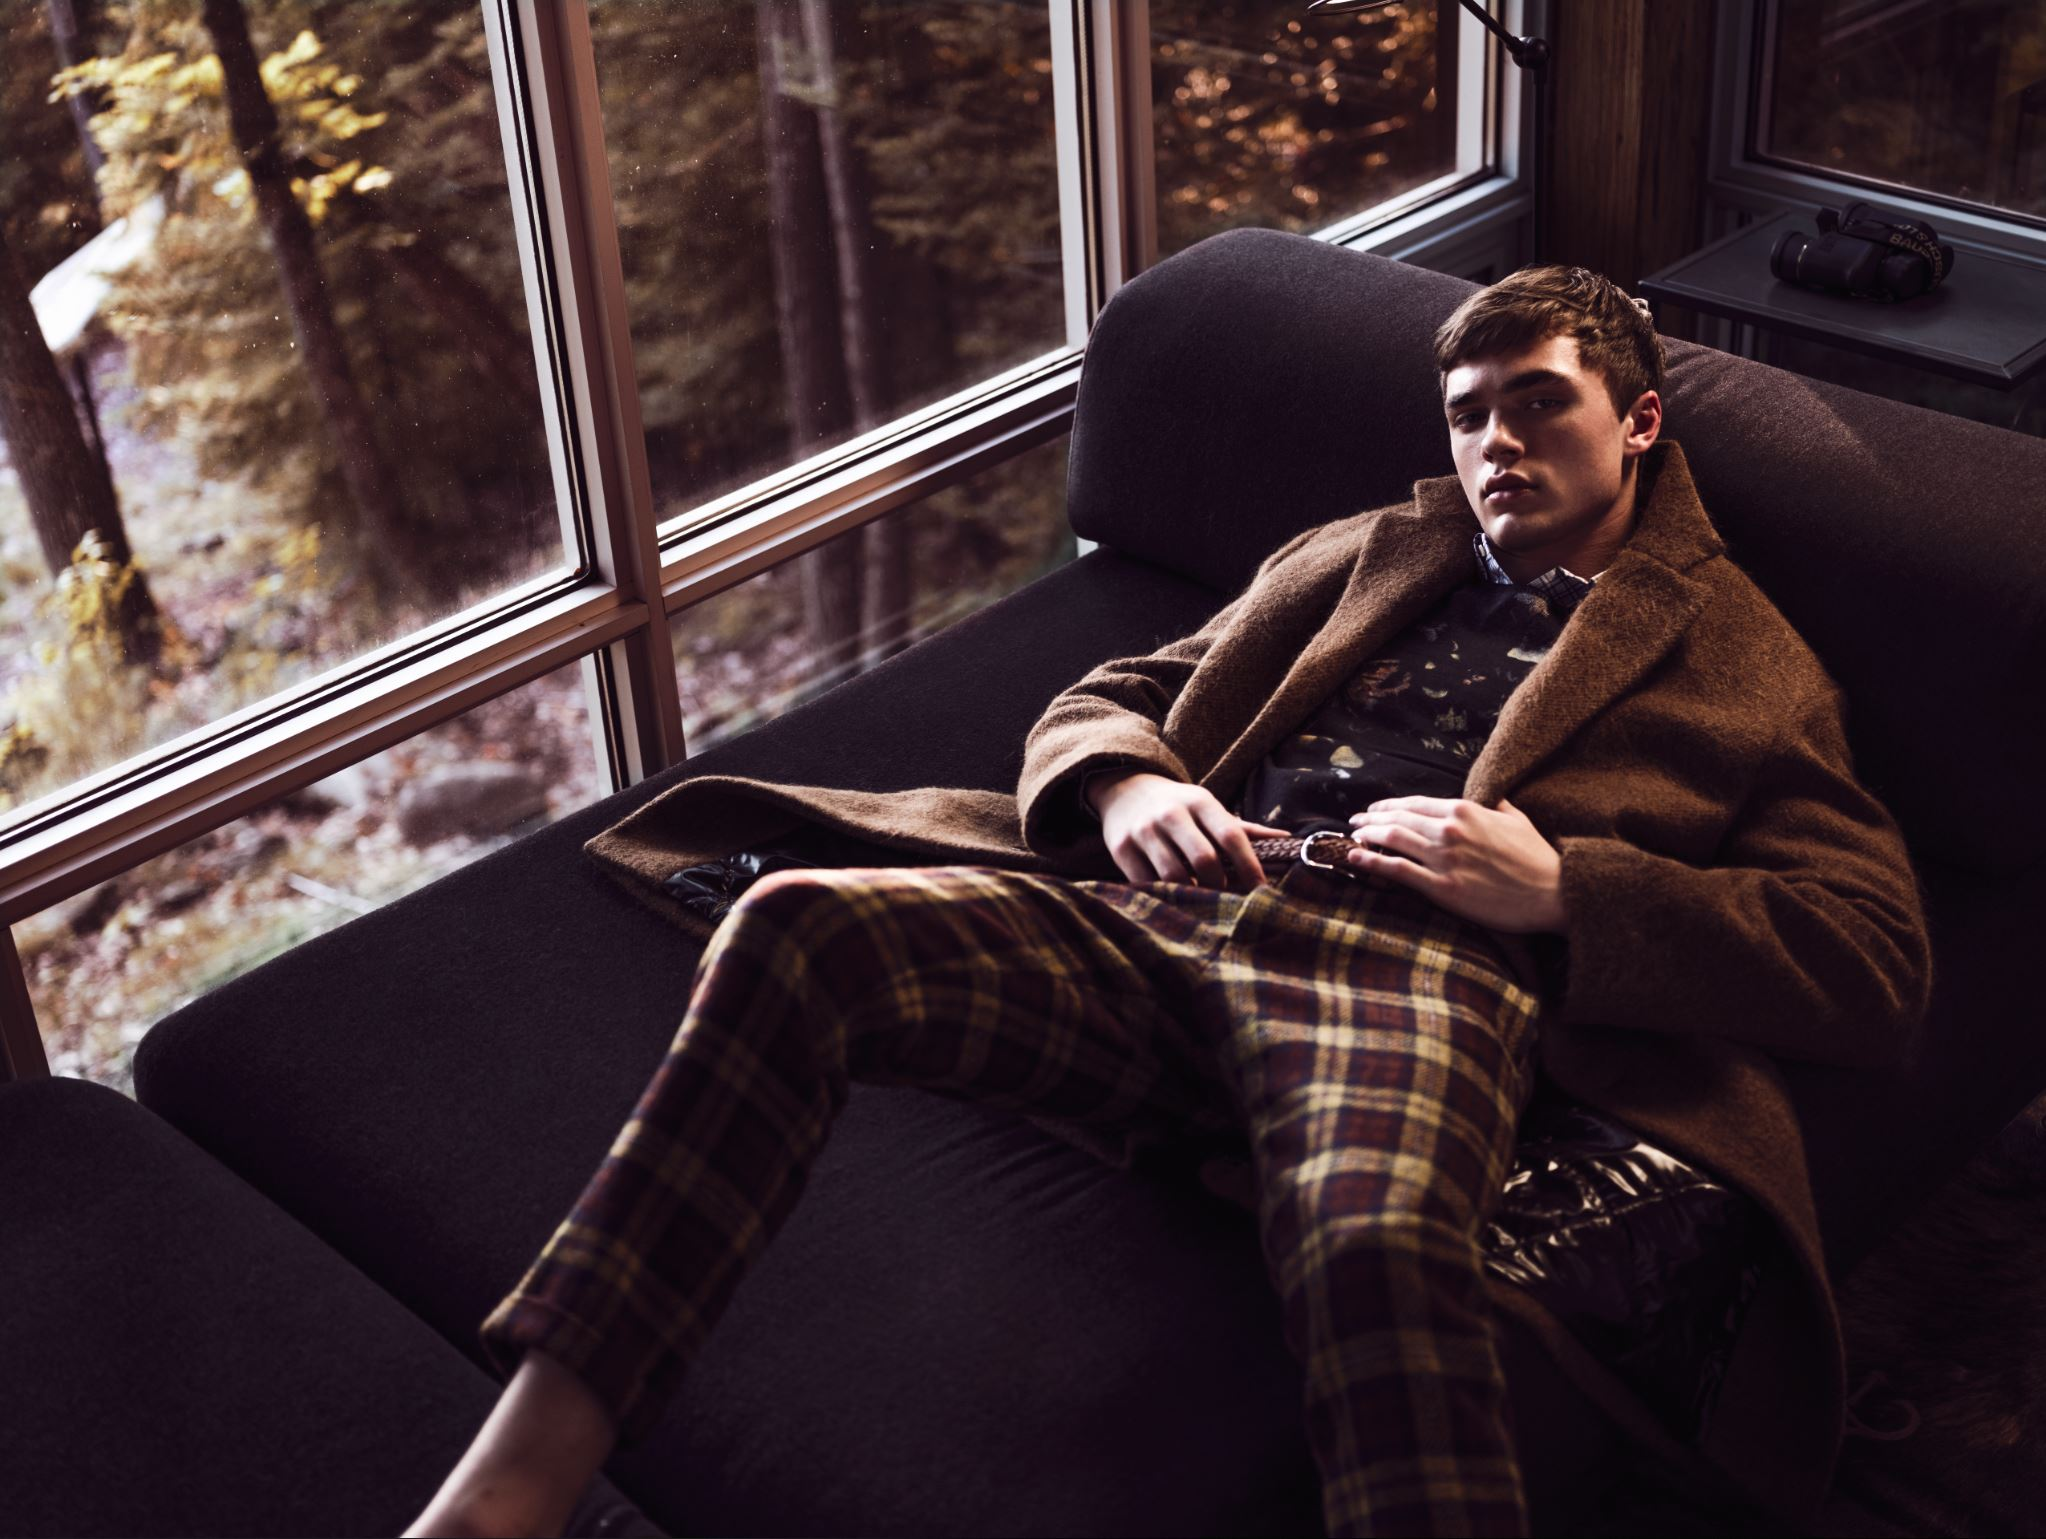 Coat DRIES VAN NOTEN at HOLT RENFREW ($2,520). Sweater STRELLSON ($198). Shirt PRADA ($850). Belt ANDERSON'S ($165). Pants MARNI at HOLT RENFREW ($1,420). Shoes GUCCI ($810).